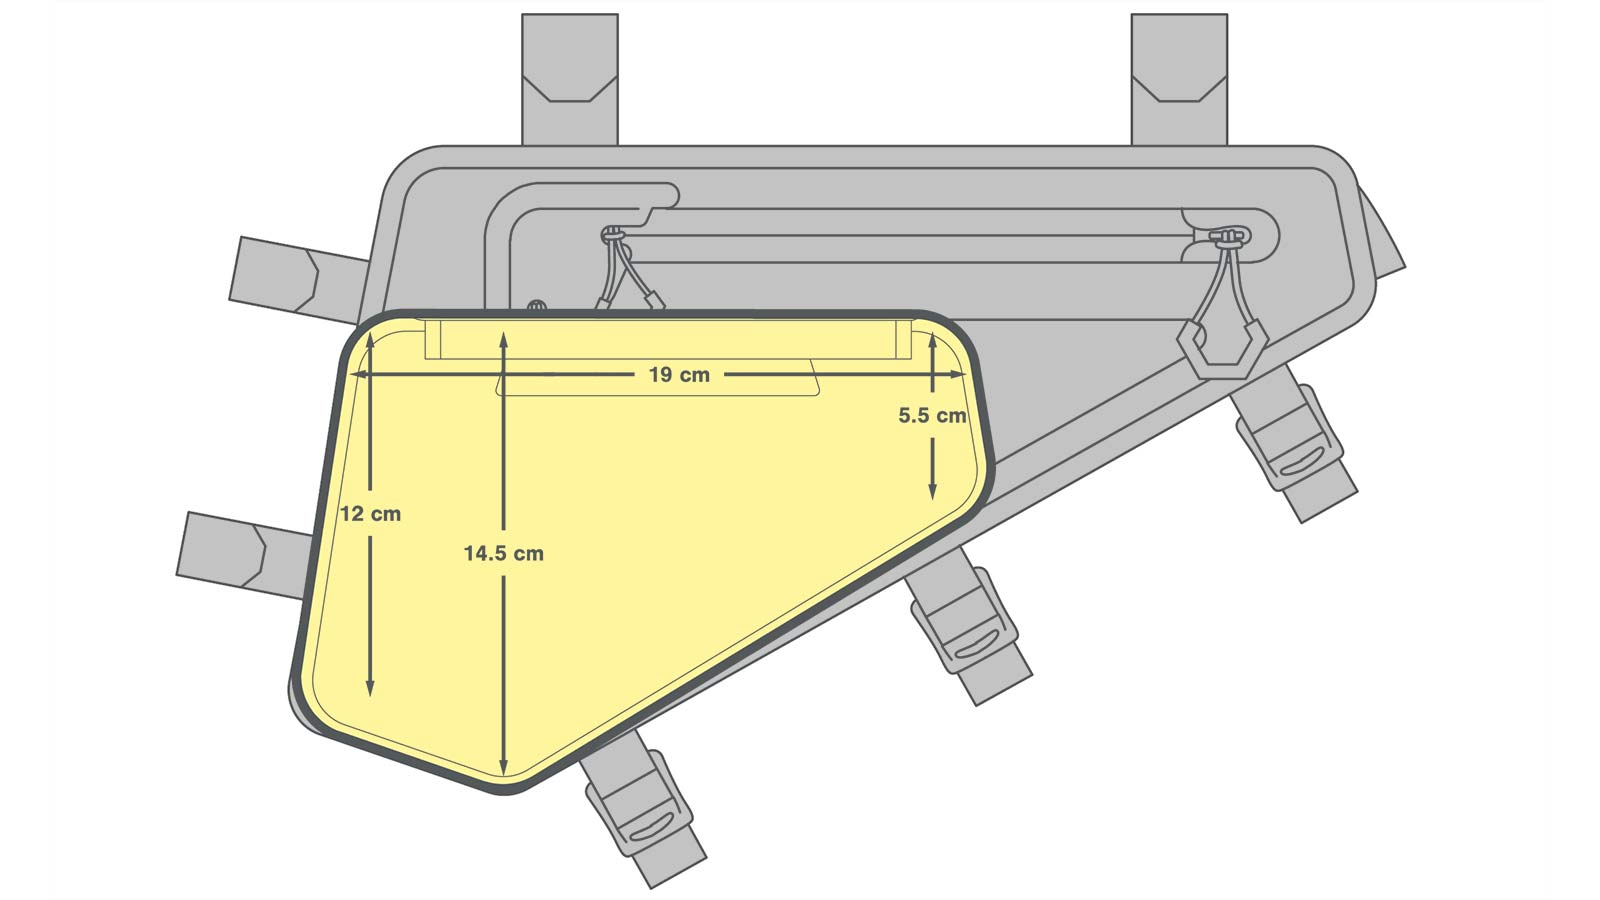 Apidura 1.5L frame Pack Hydration Bladder, Innovation Lab bikepacking frame pack water bag, dimensions